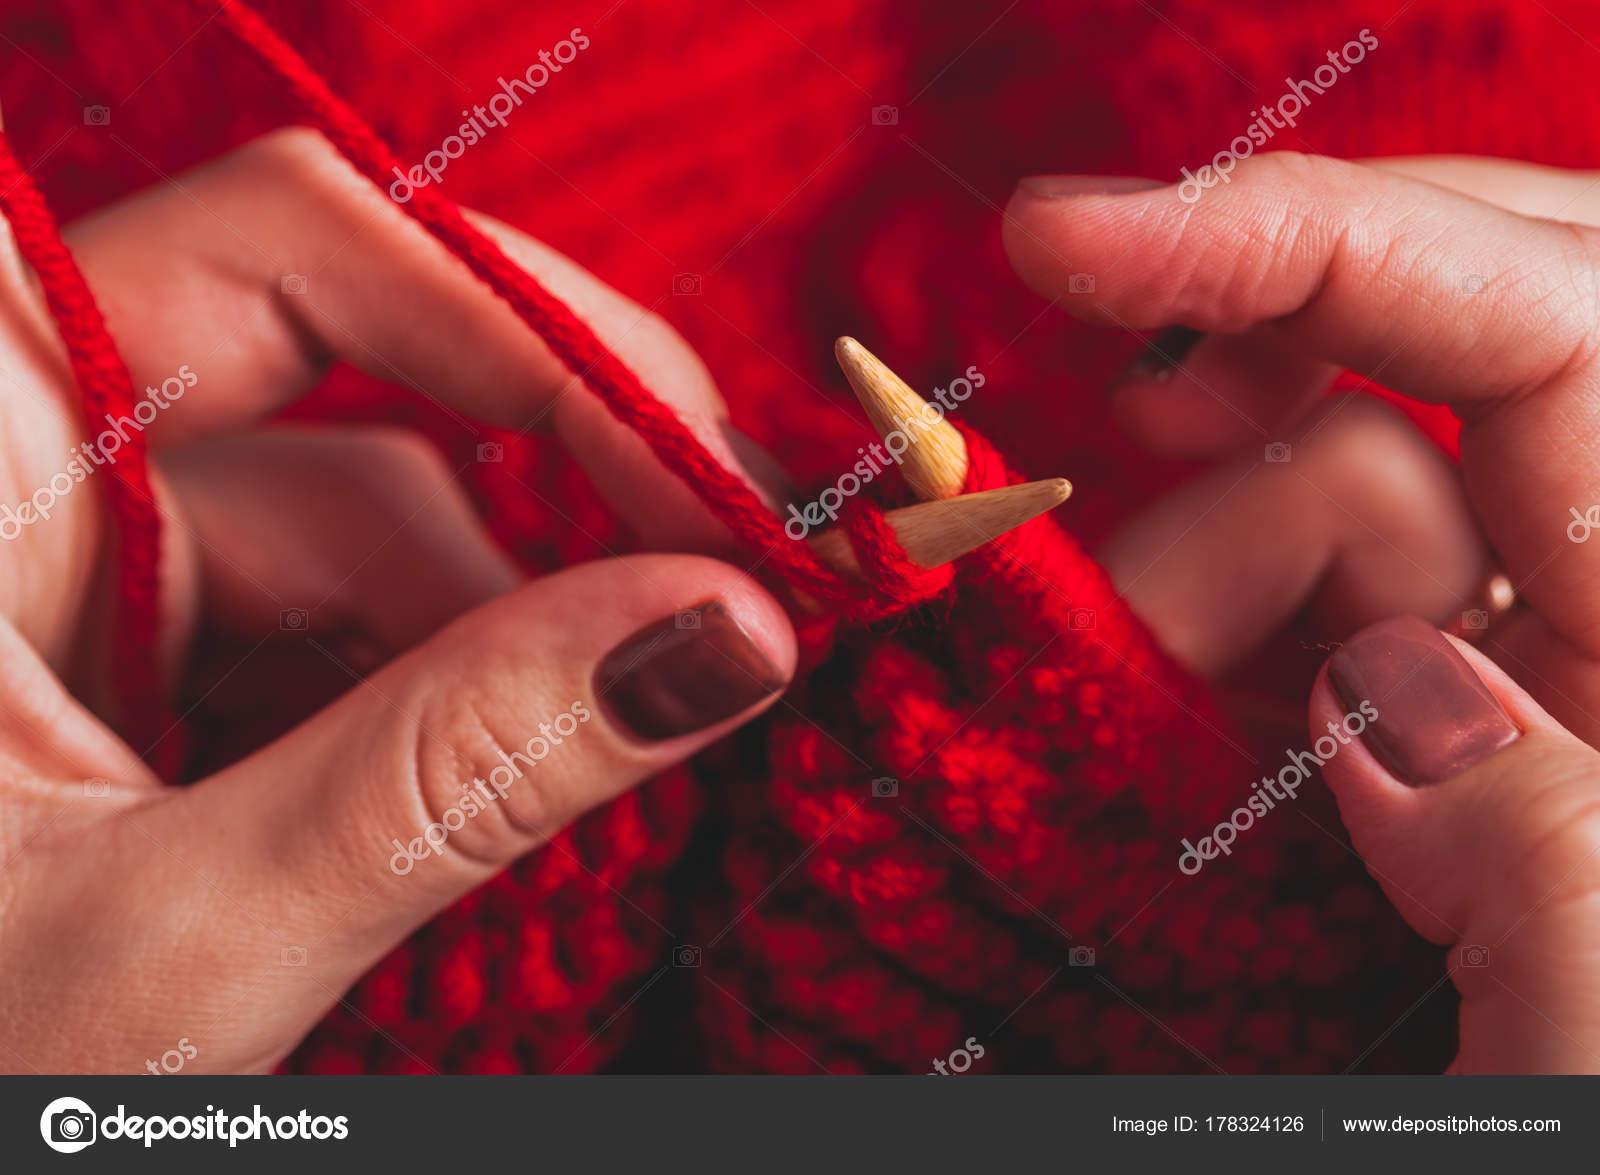 a9ee59c3d205 Χέρια Γυναικεία πλεκτά πουλόβερ — Φωτογραφία Αρχείου © oksixx  178324126